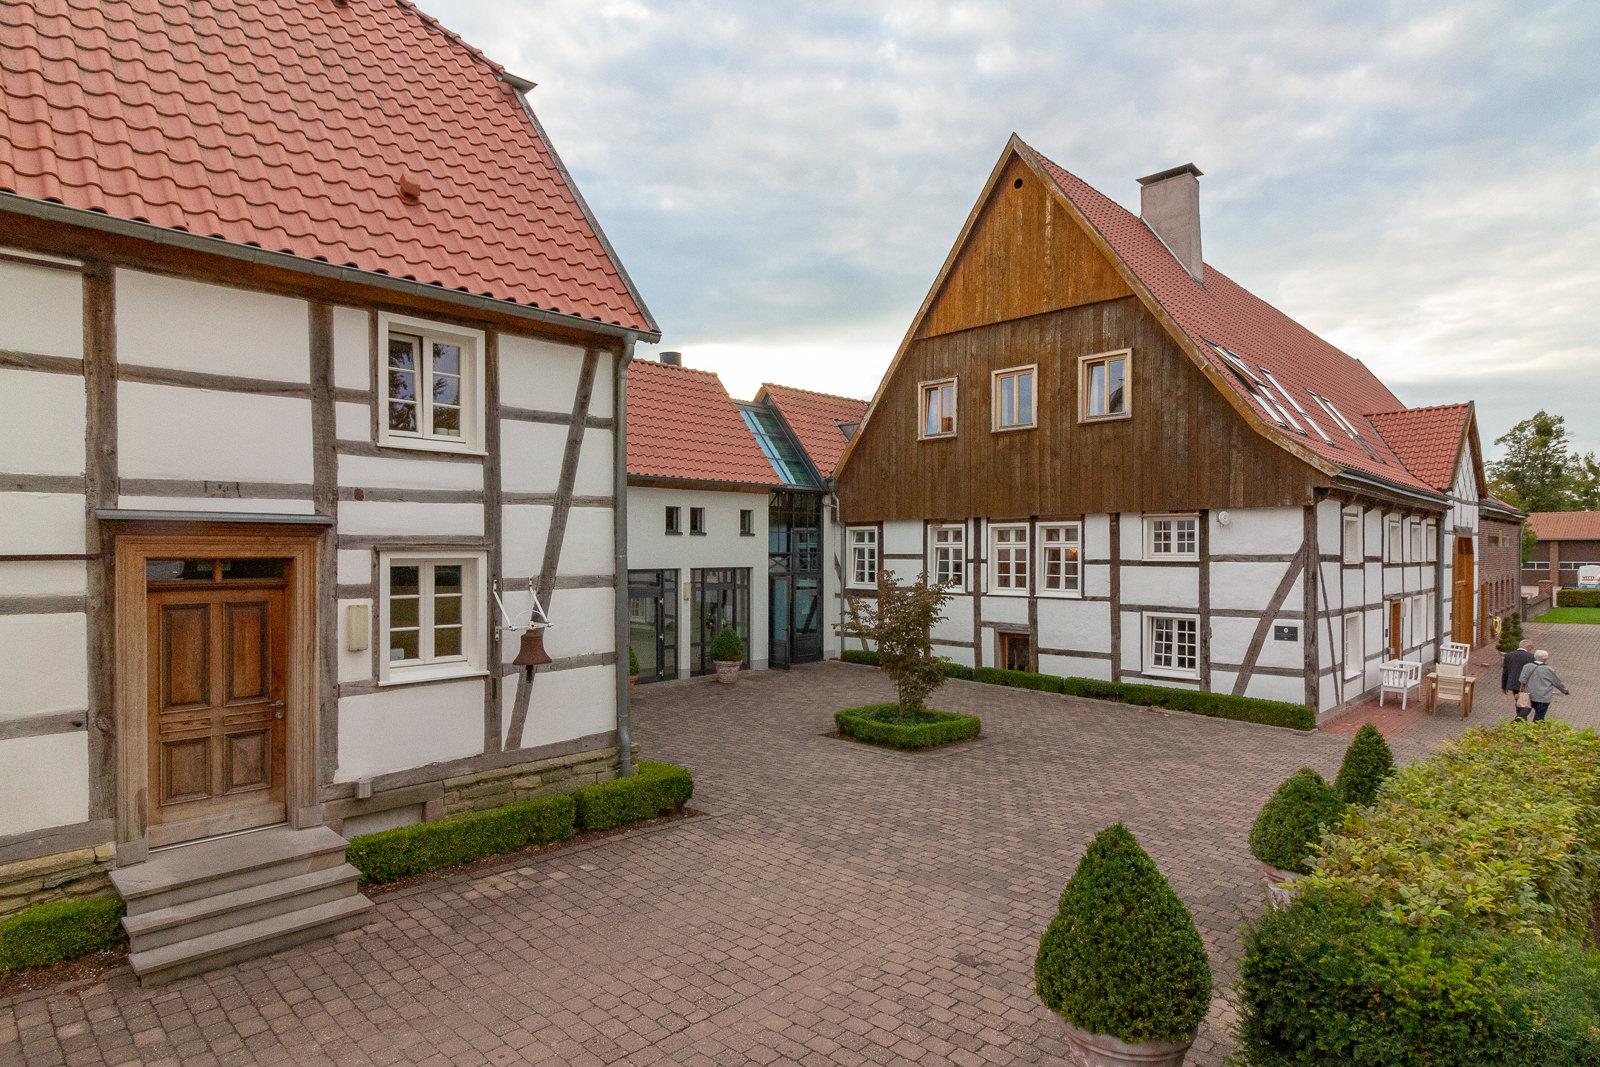 Gut Kump, Westfalen, Westfälisch Genießen